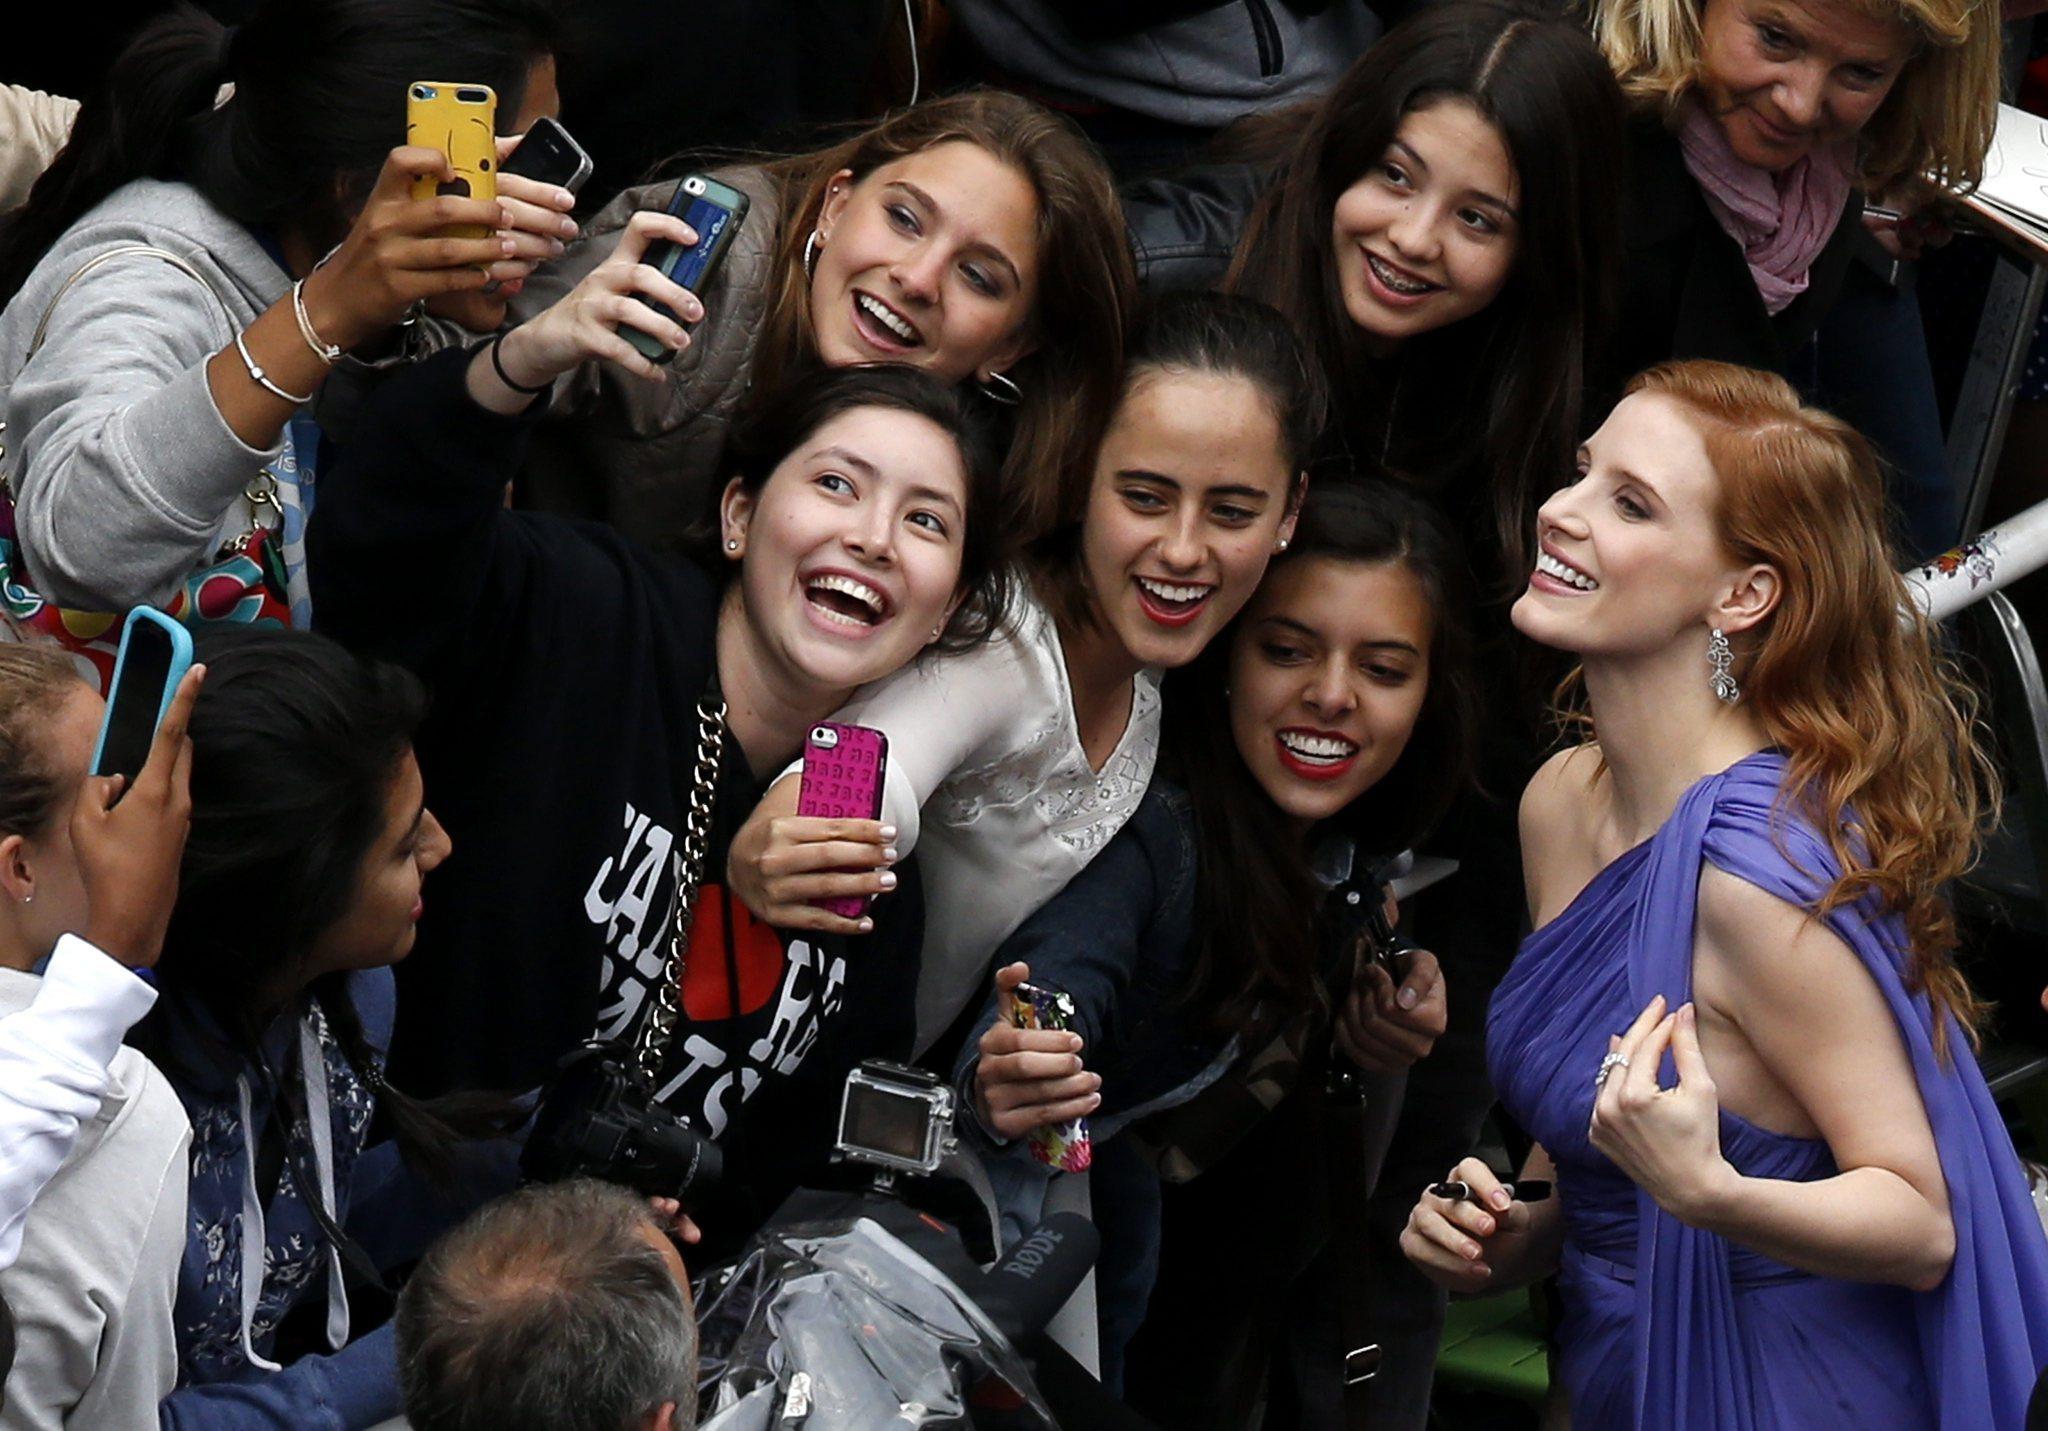 cannes-festival-celebrity-selfie